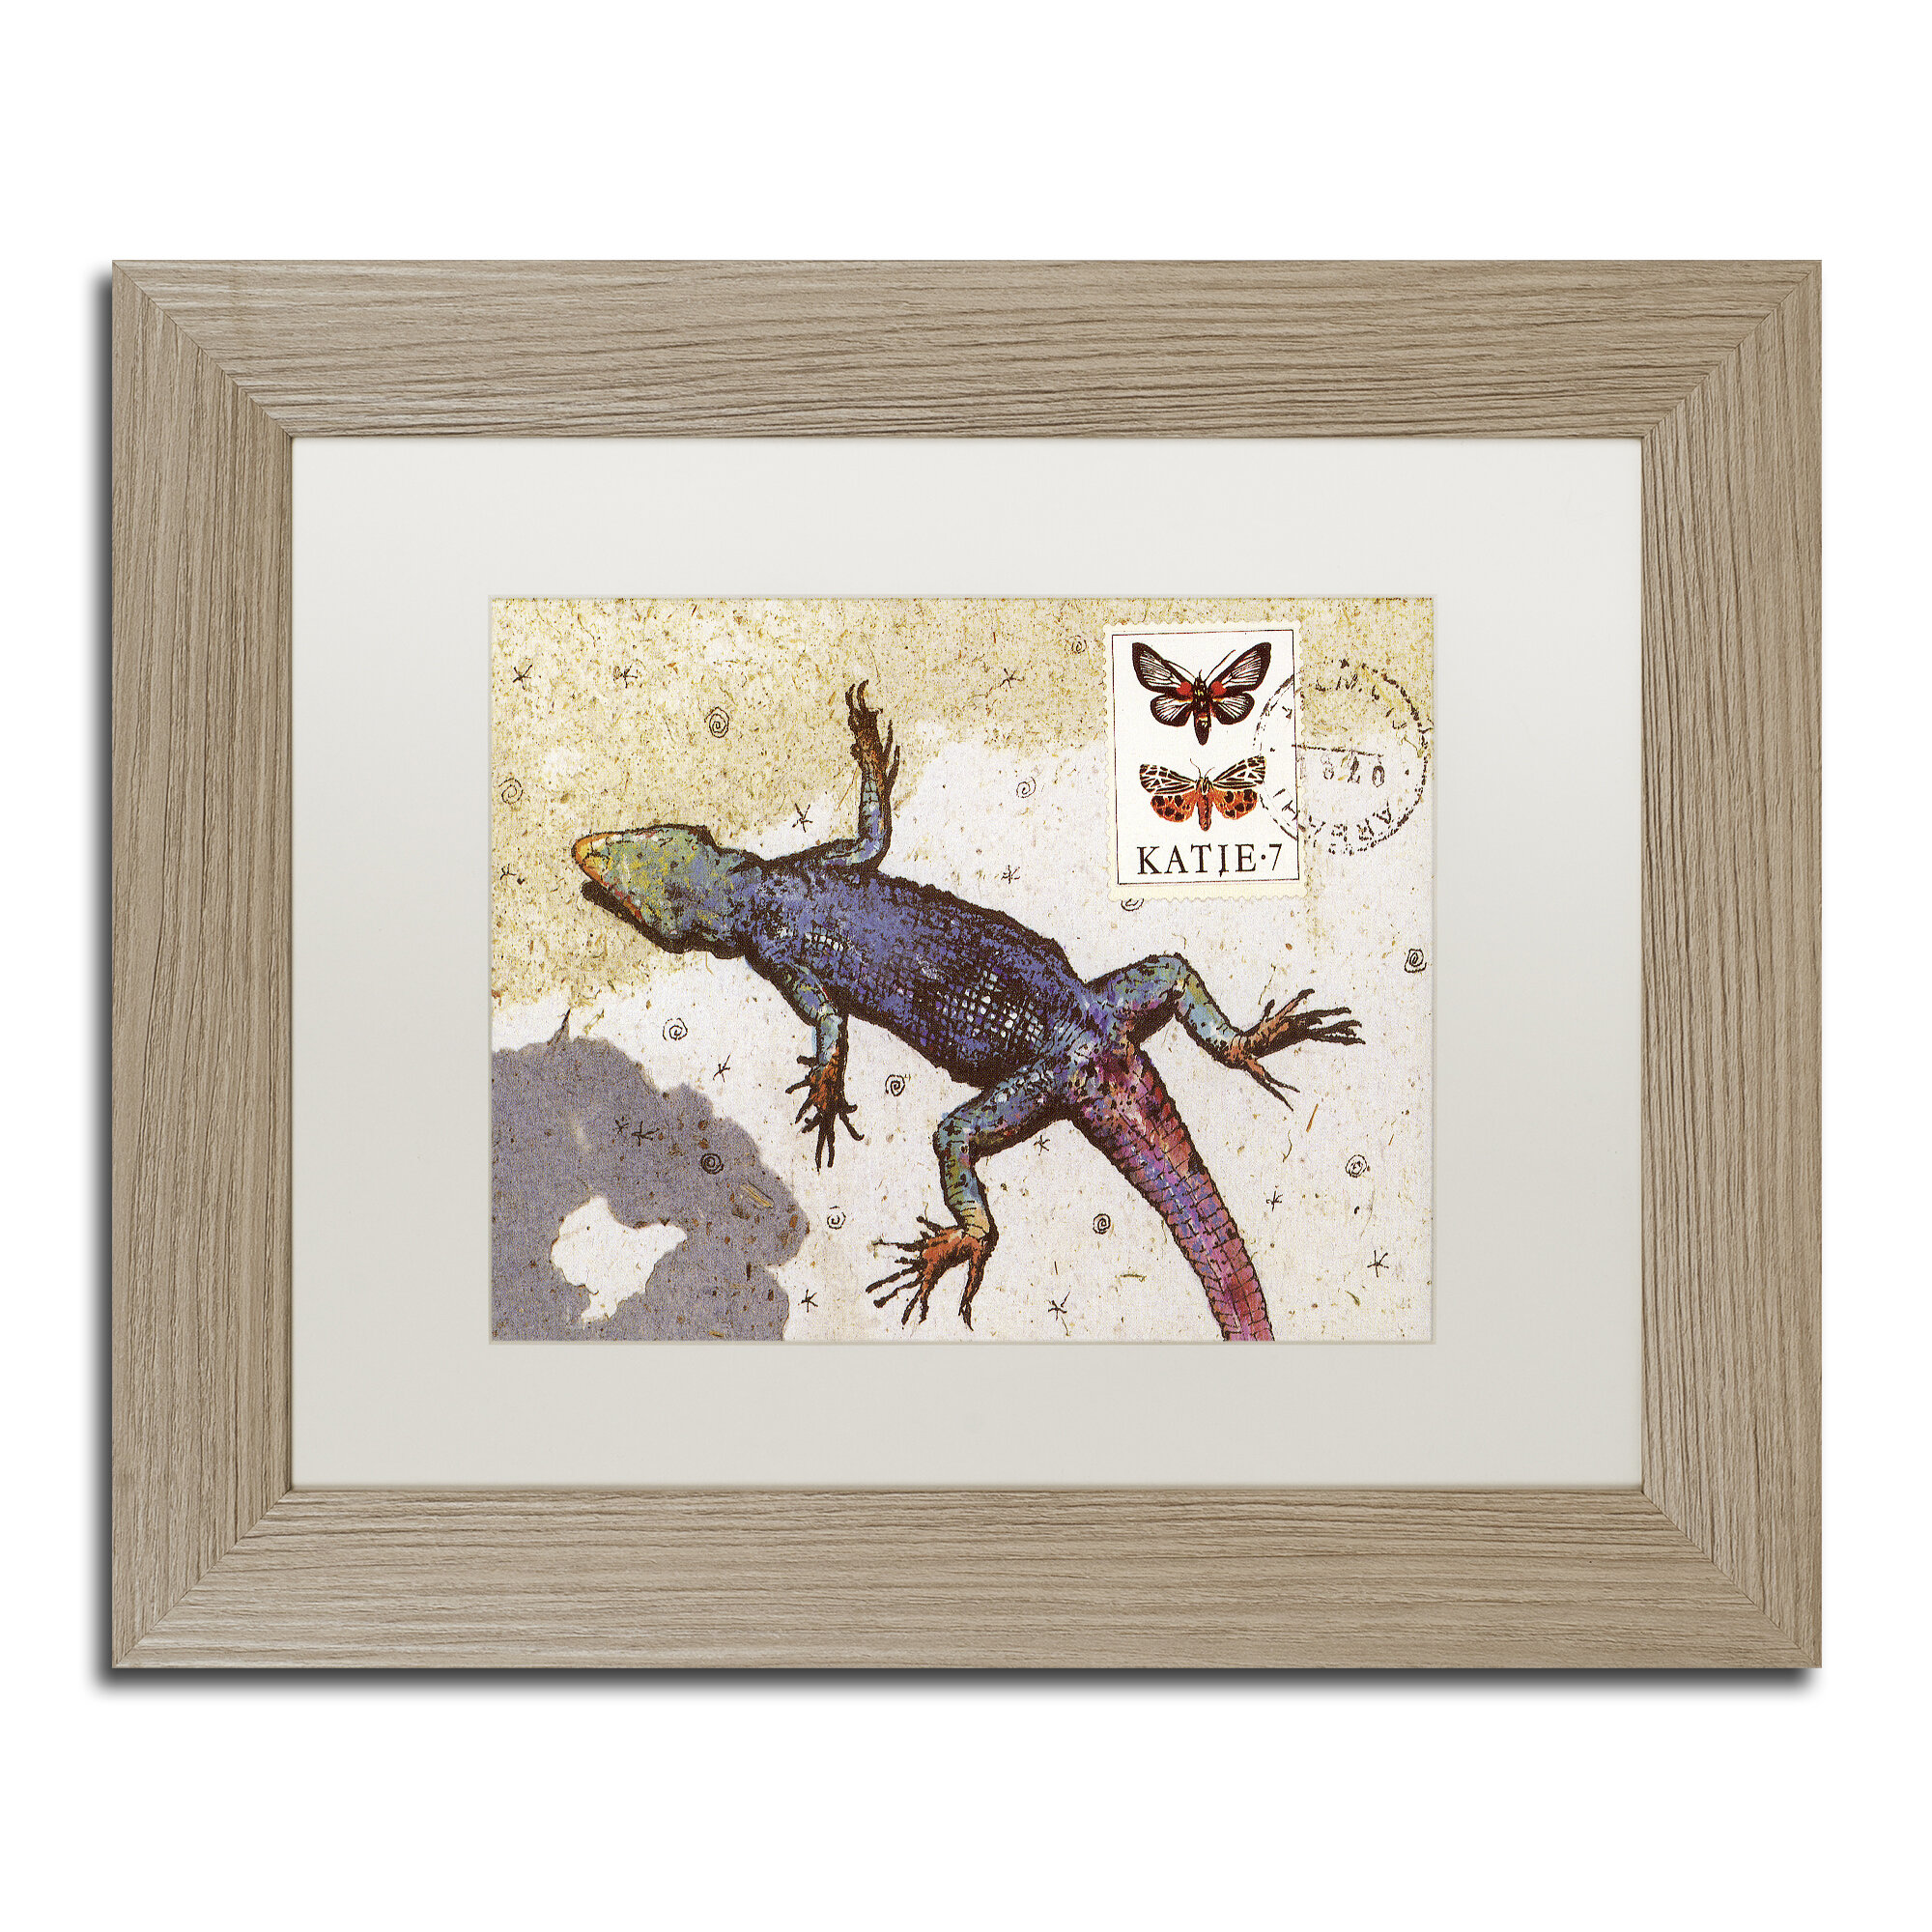 Trademark Art Rainbow Lizard By Nick Bantock Picture Frame Graphic Art Print On Canvas Wayfair